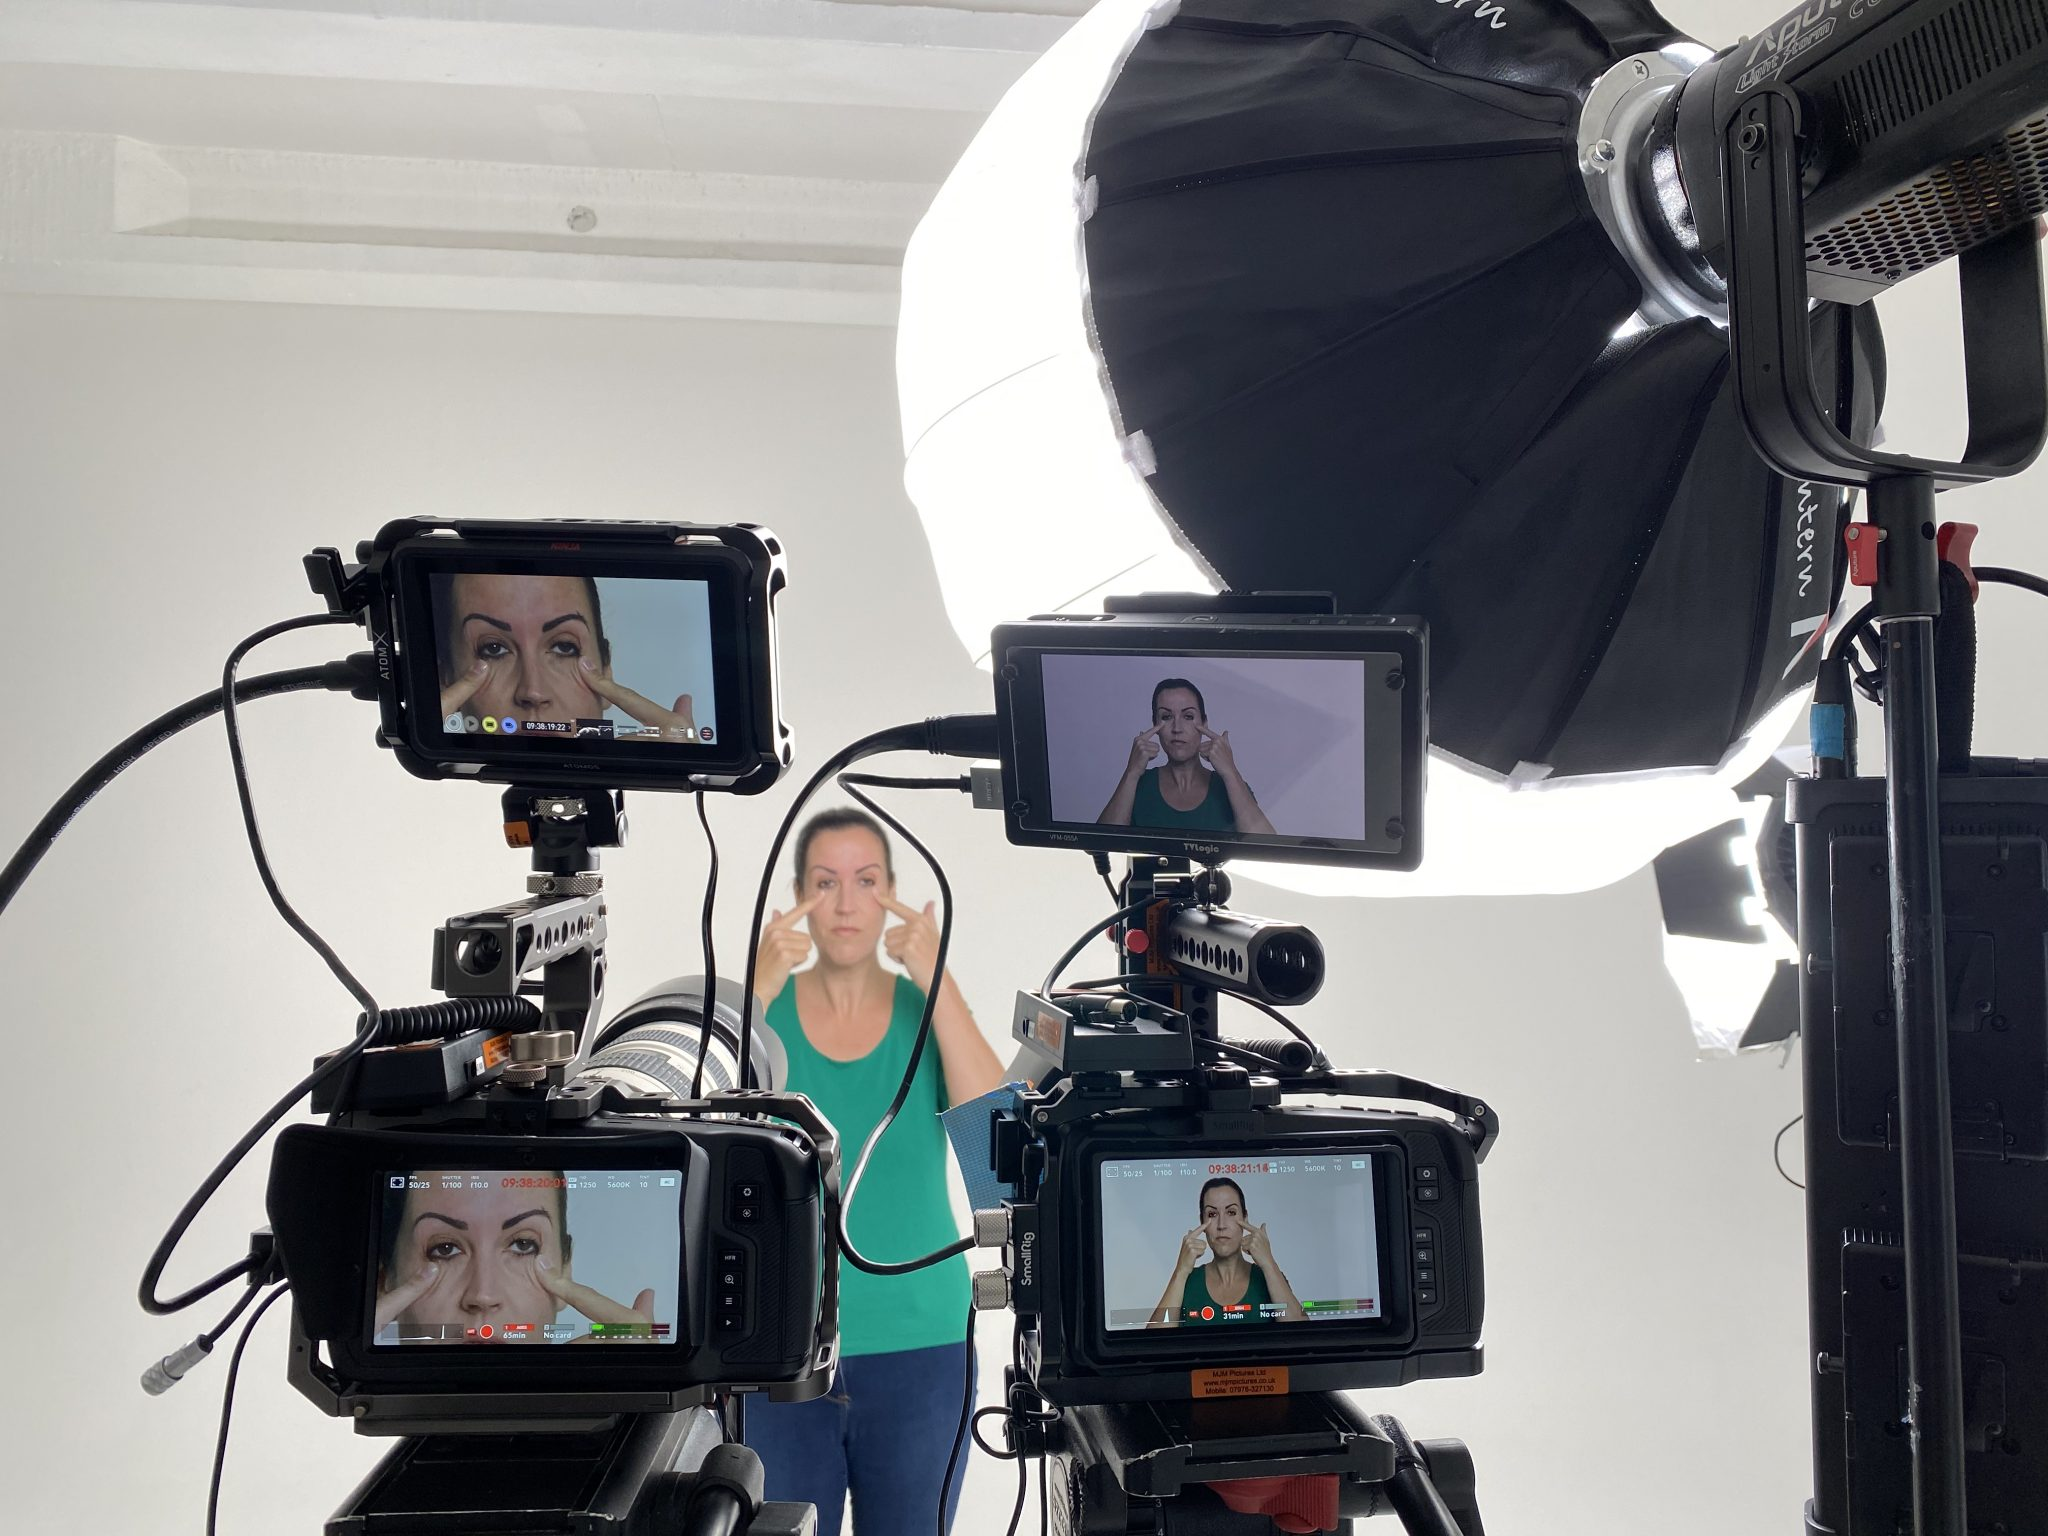 2 x Blackmagic 6K Pocket cine cameras